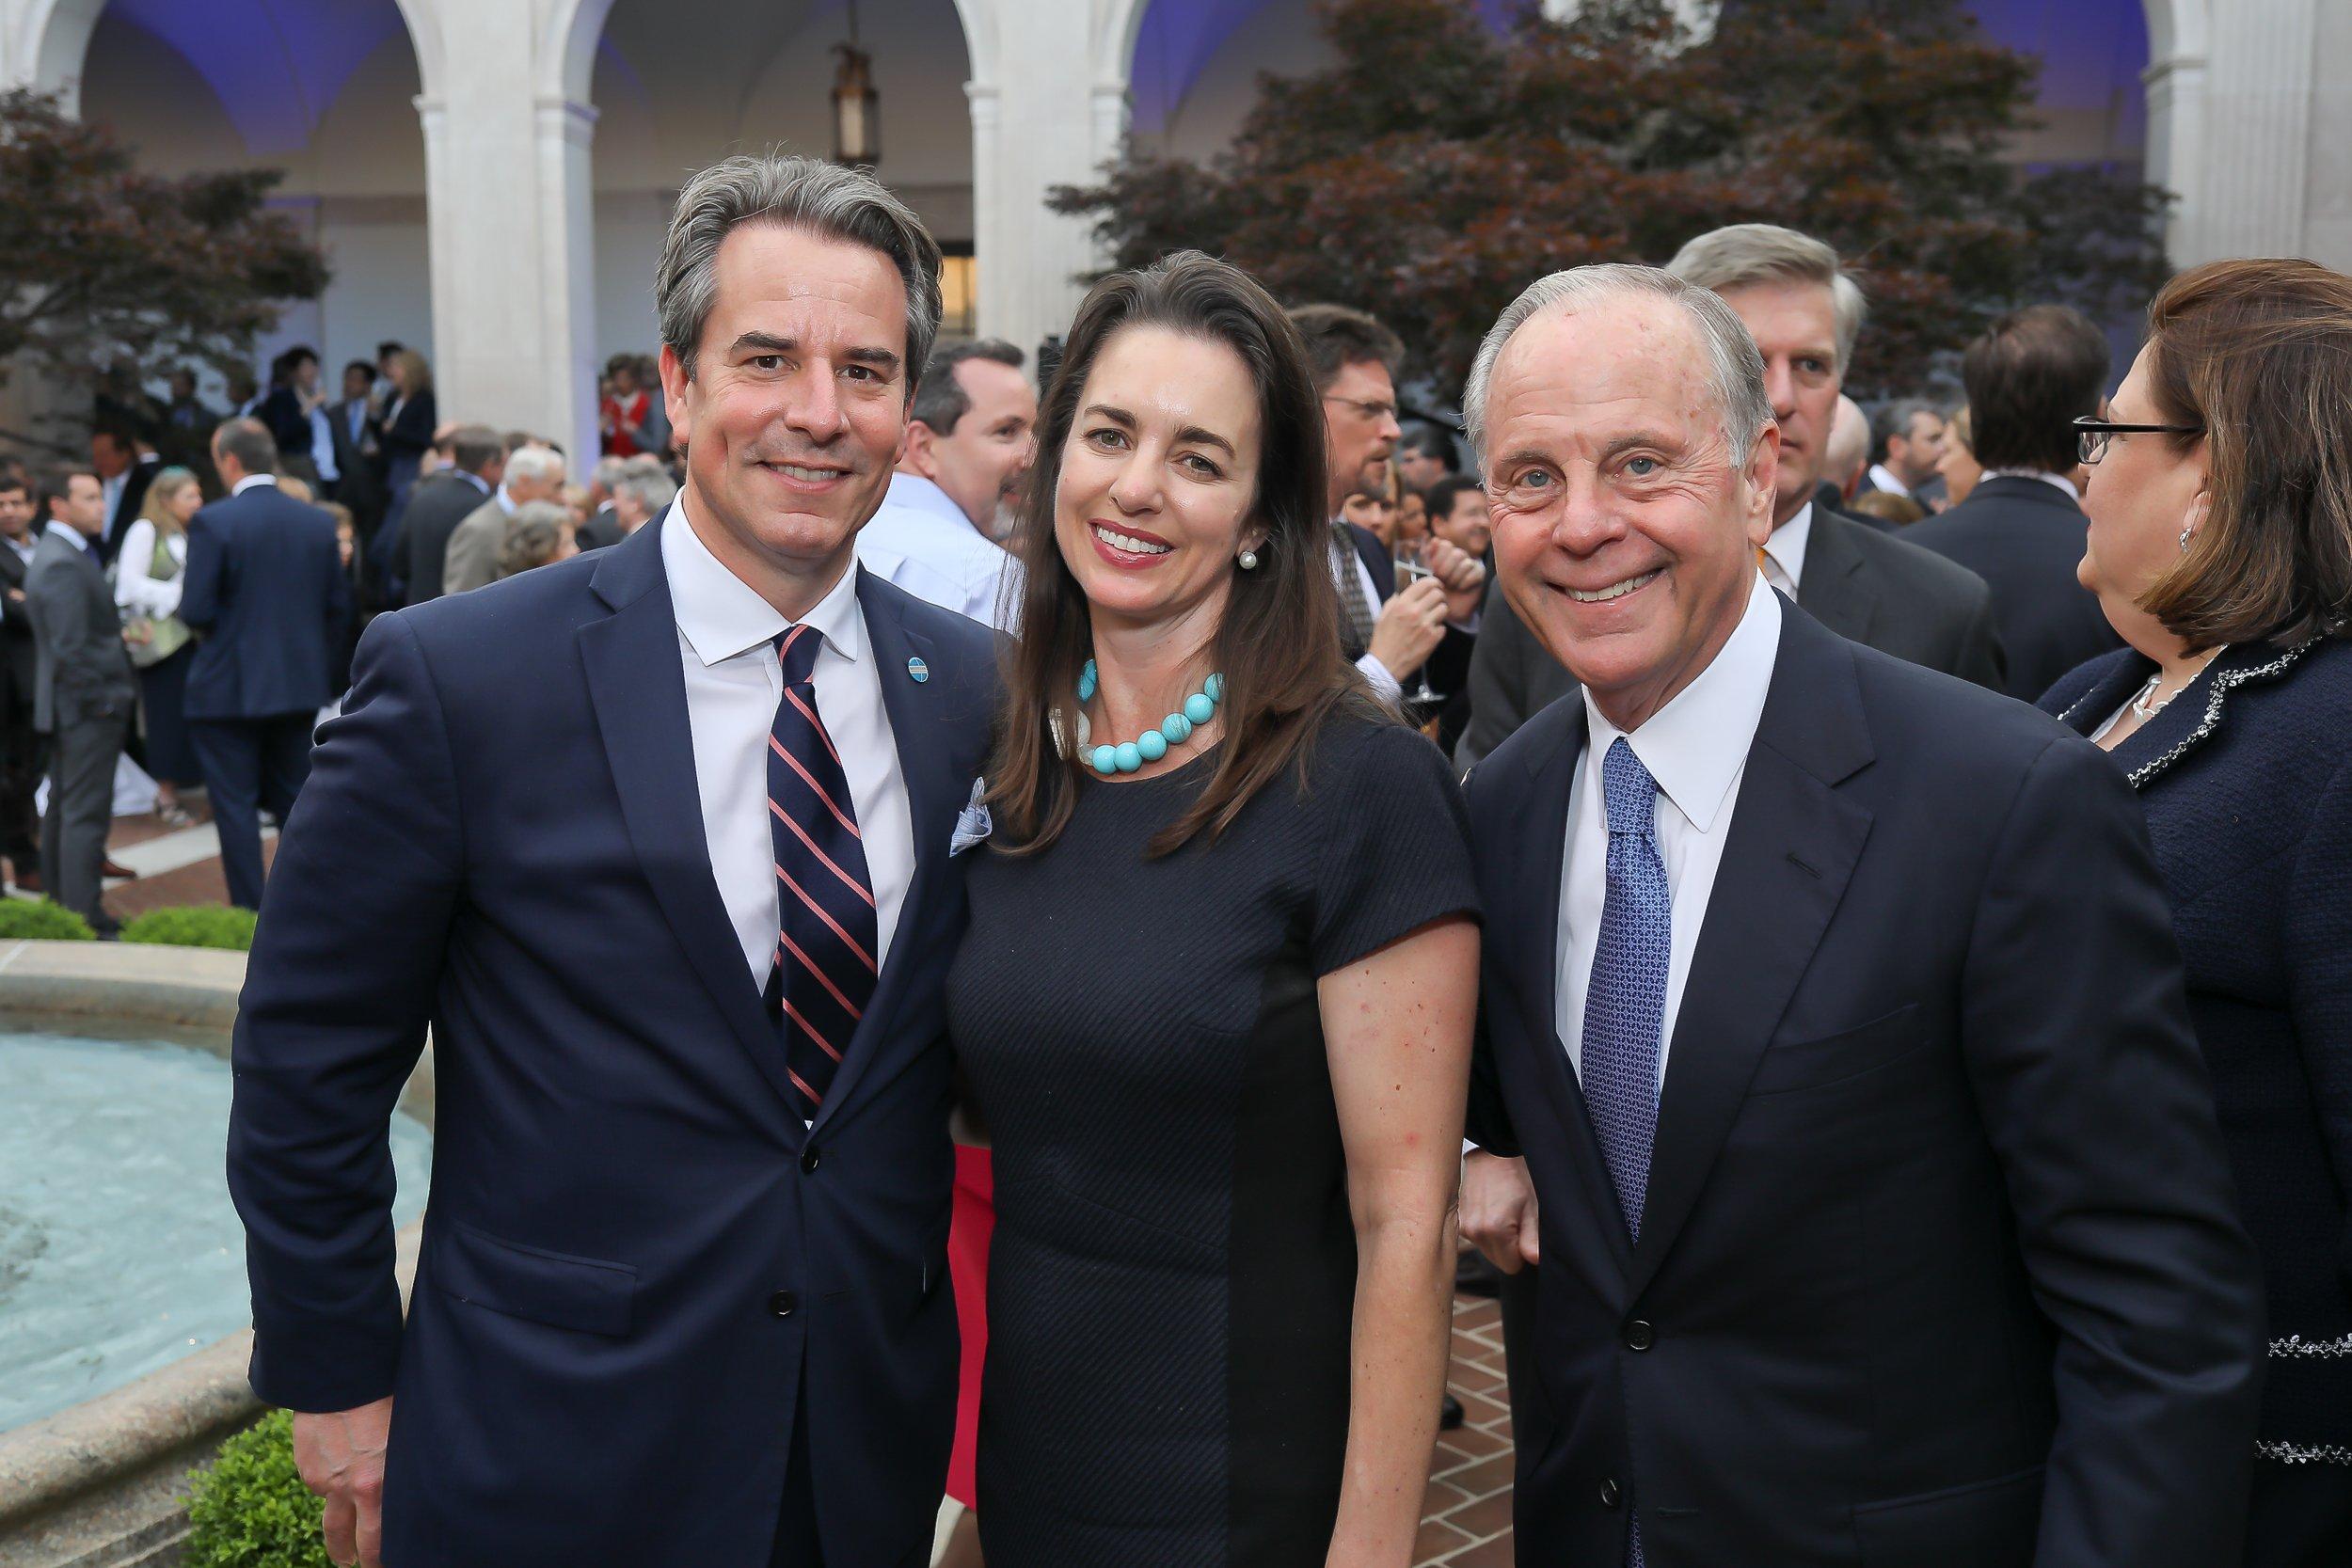 Ambassador Stuart Holliday, wife Gwen Holliday, and Mack McLarty